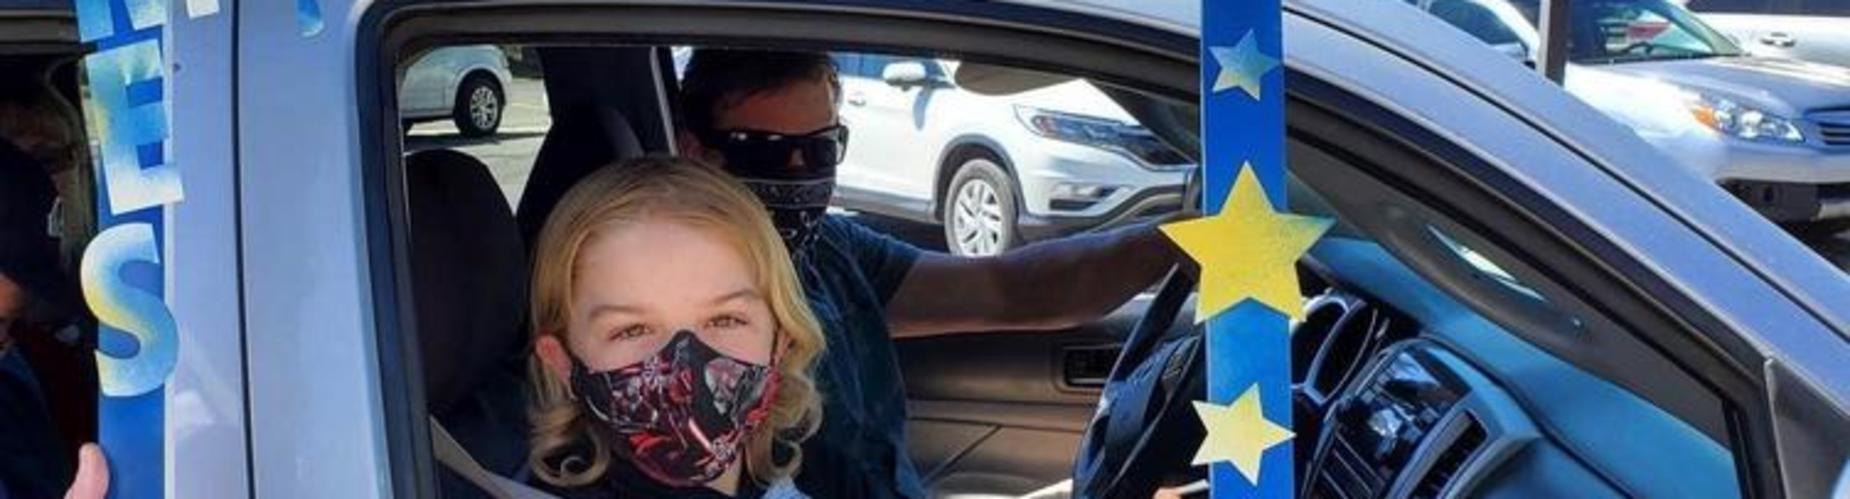 Student inside a car